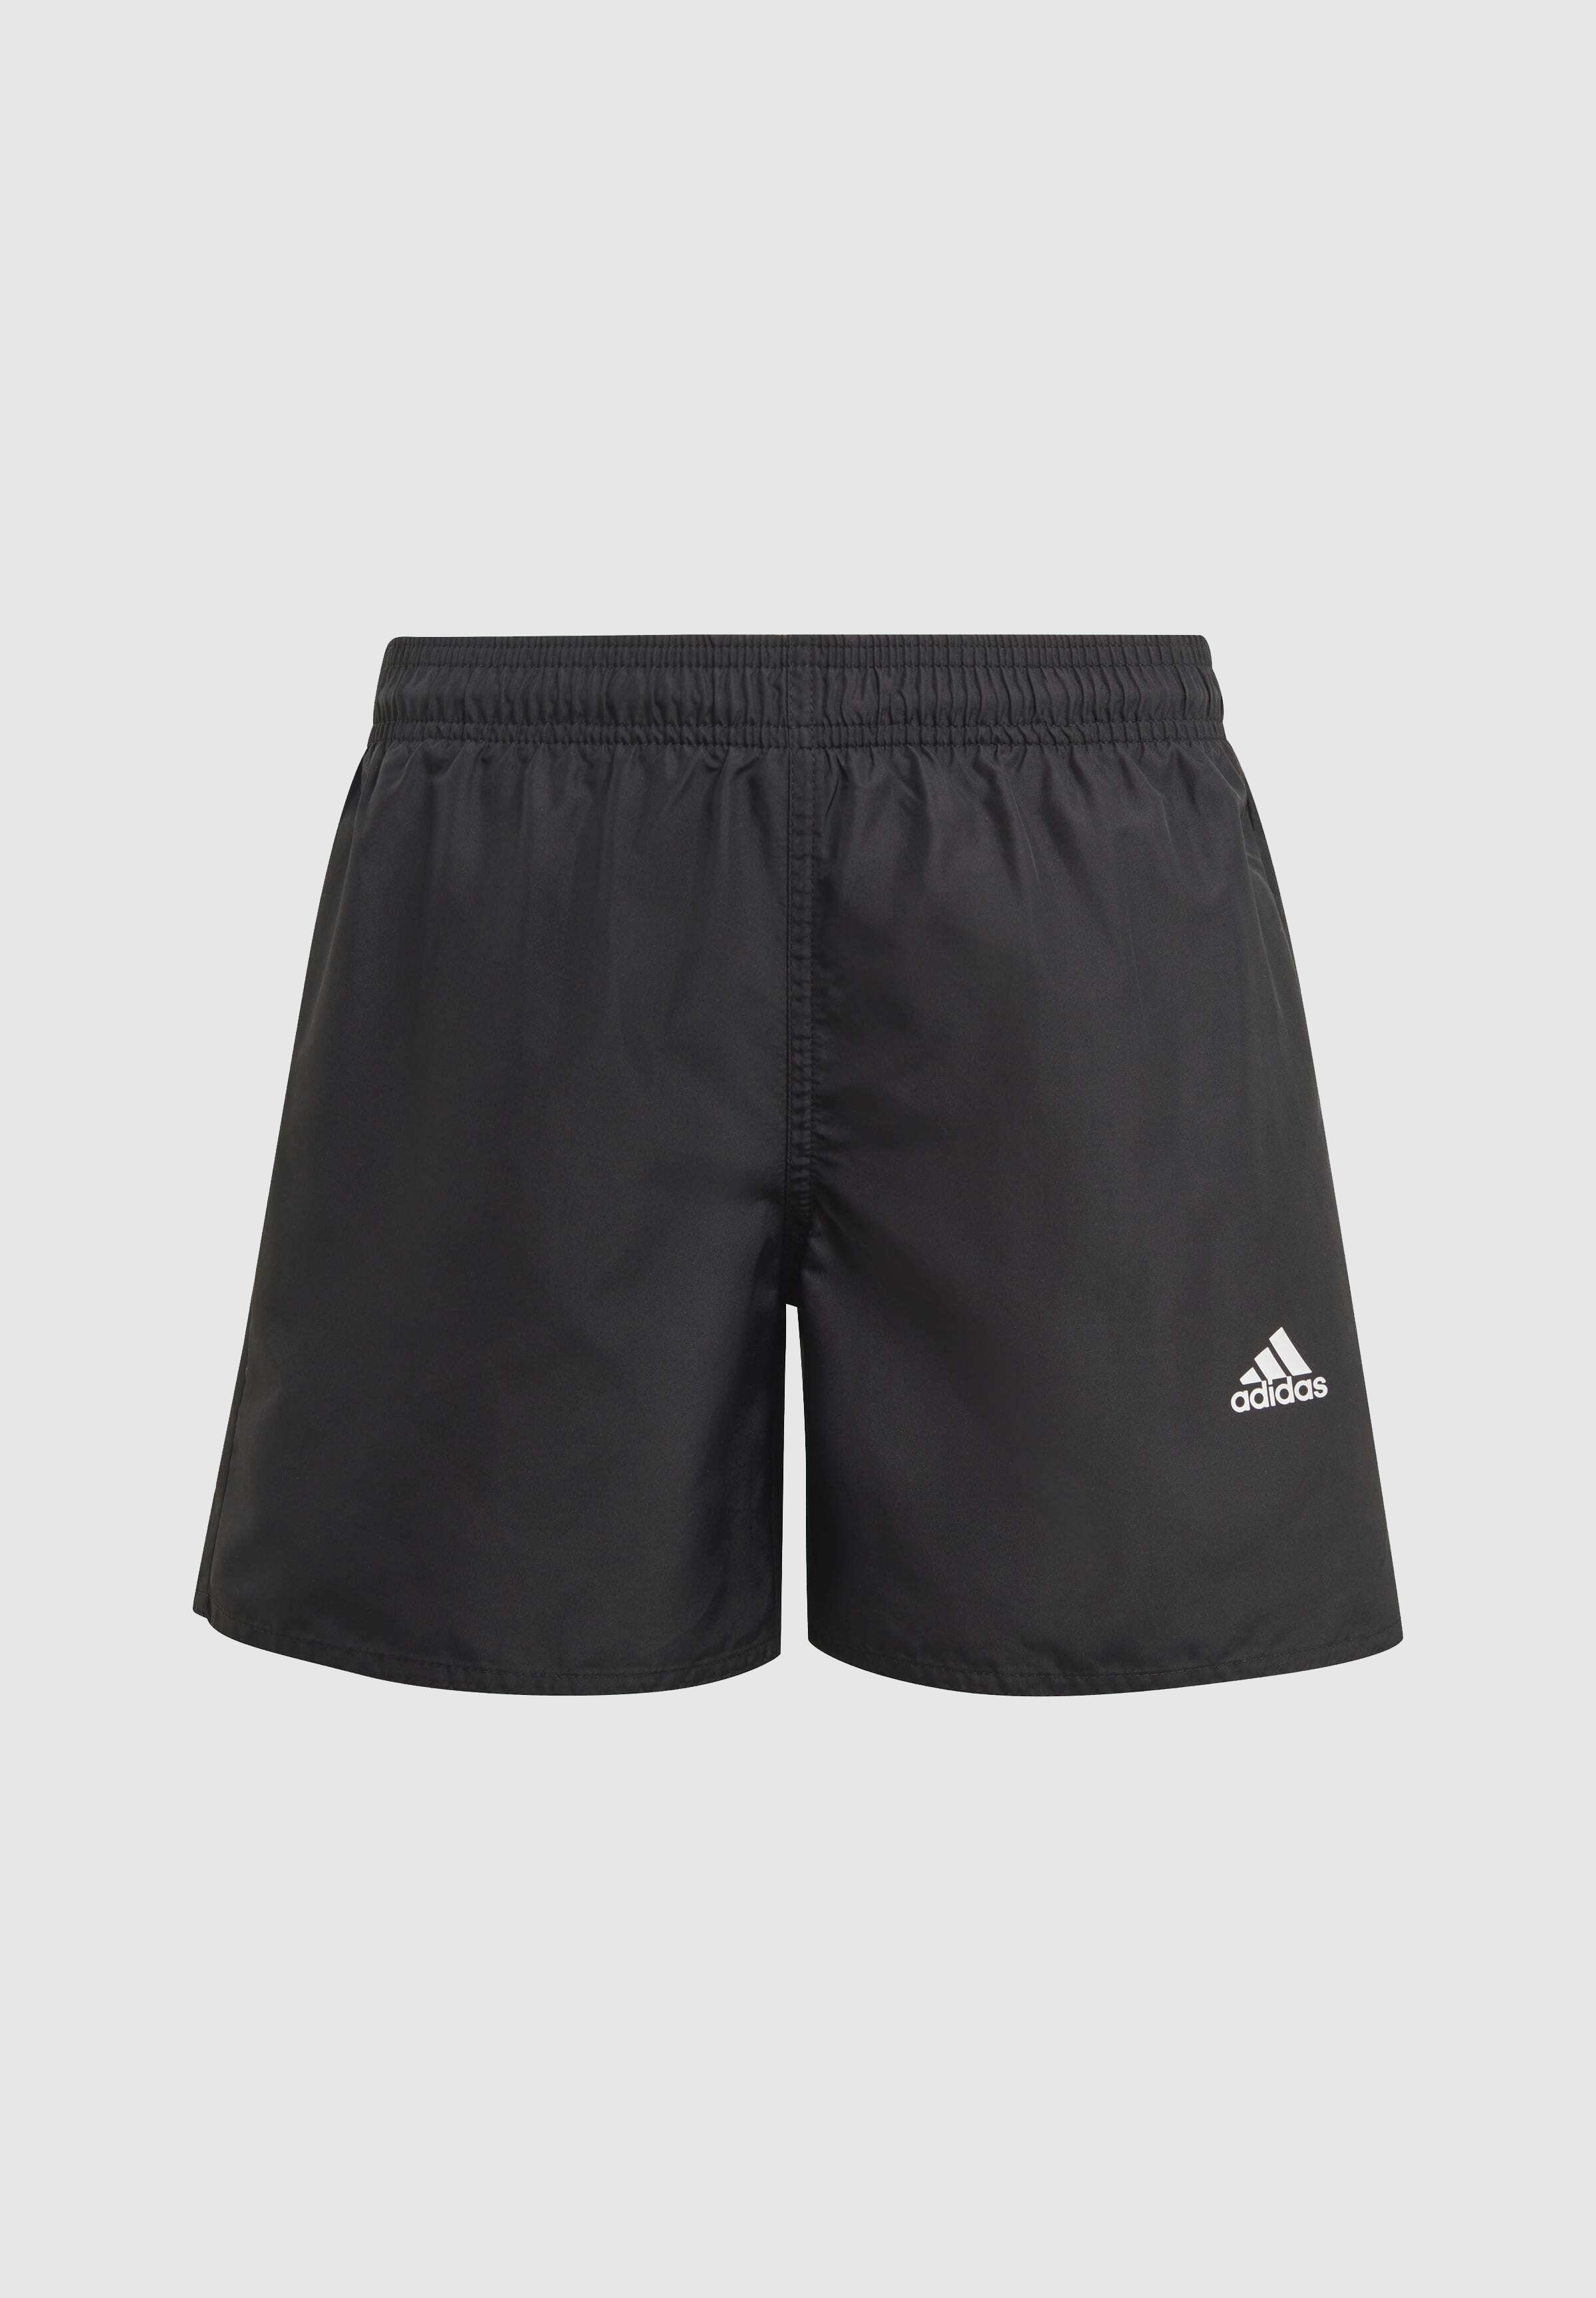 Kids BADGE OF SPORT PRIMEGREEN REGULAR SWIM SHORTS - Swimming shorts